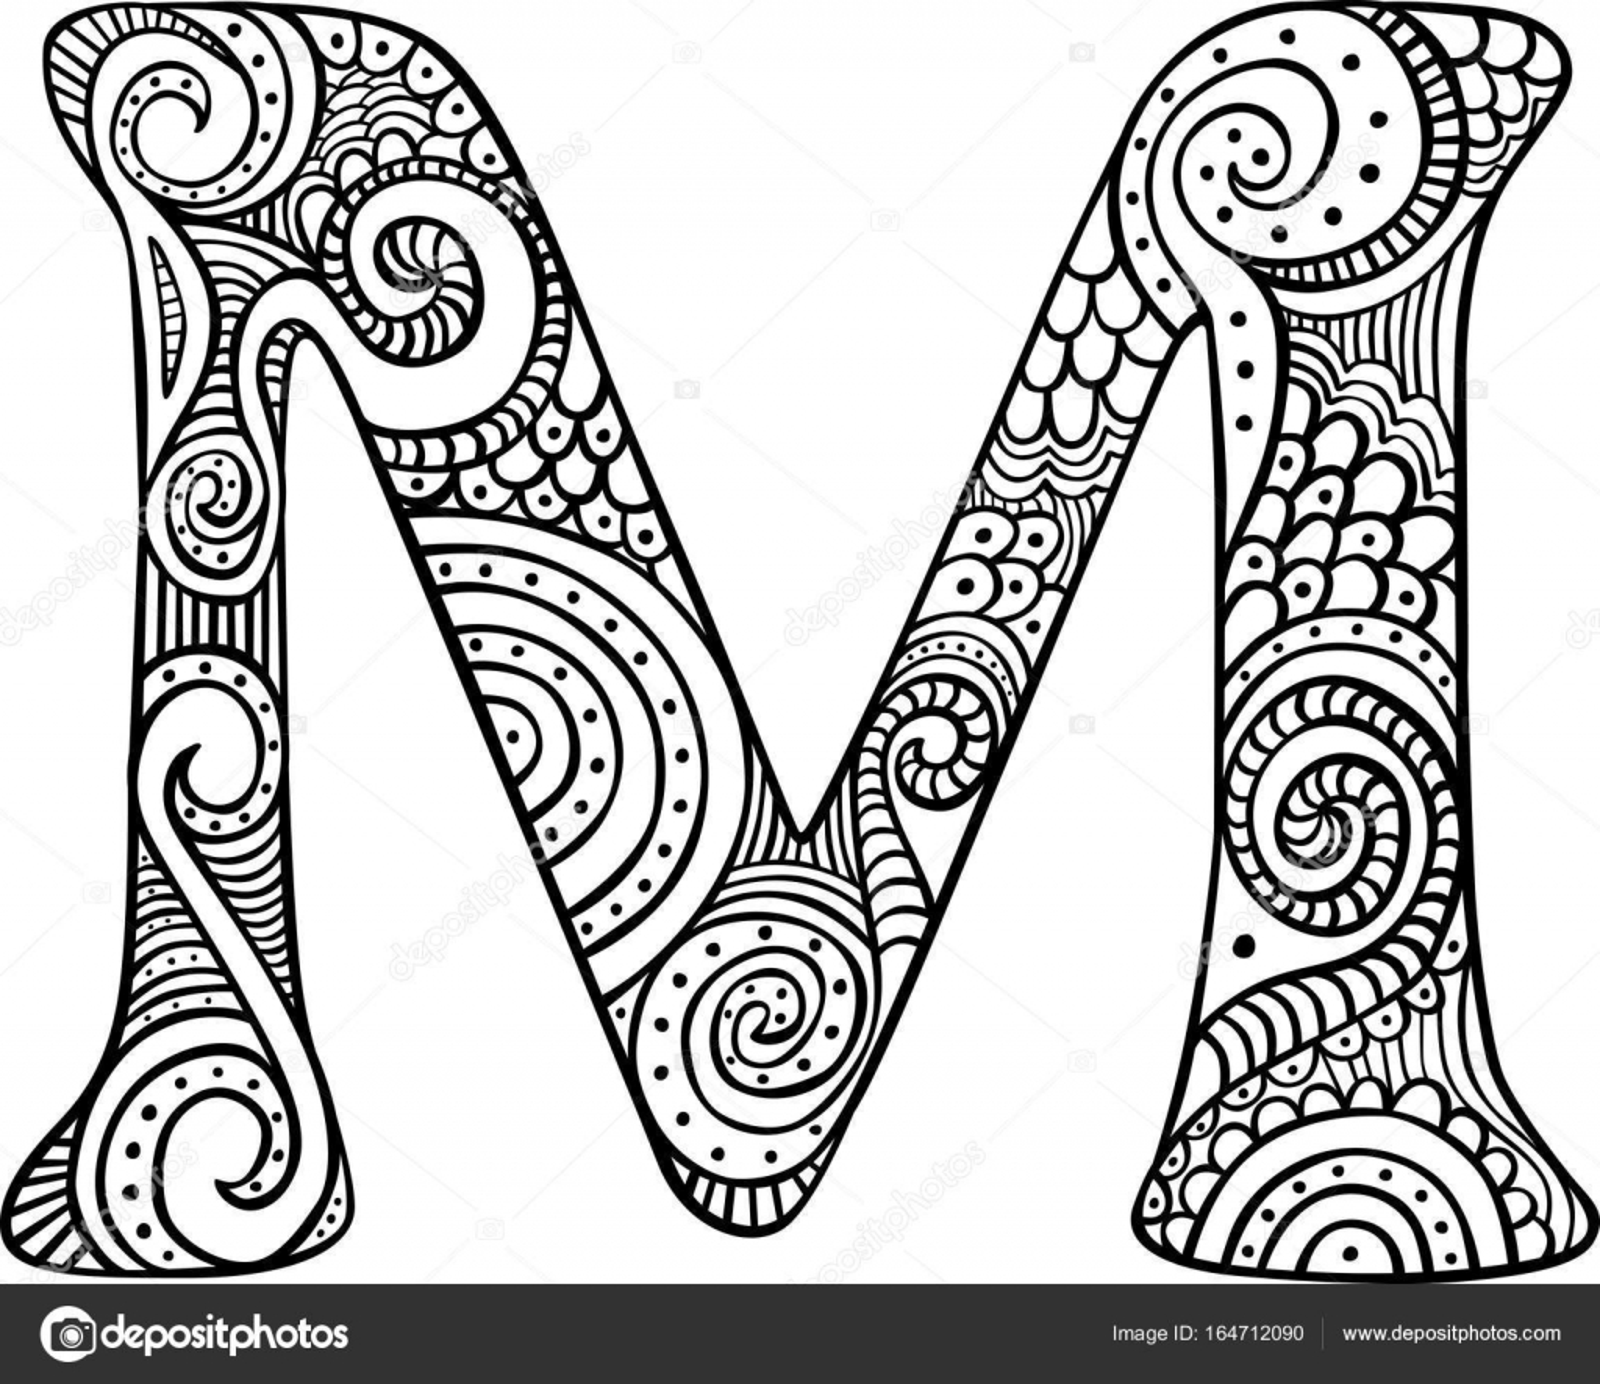 Dibujos Letra M Dibujo Letra M Vector De Stock Nahhan